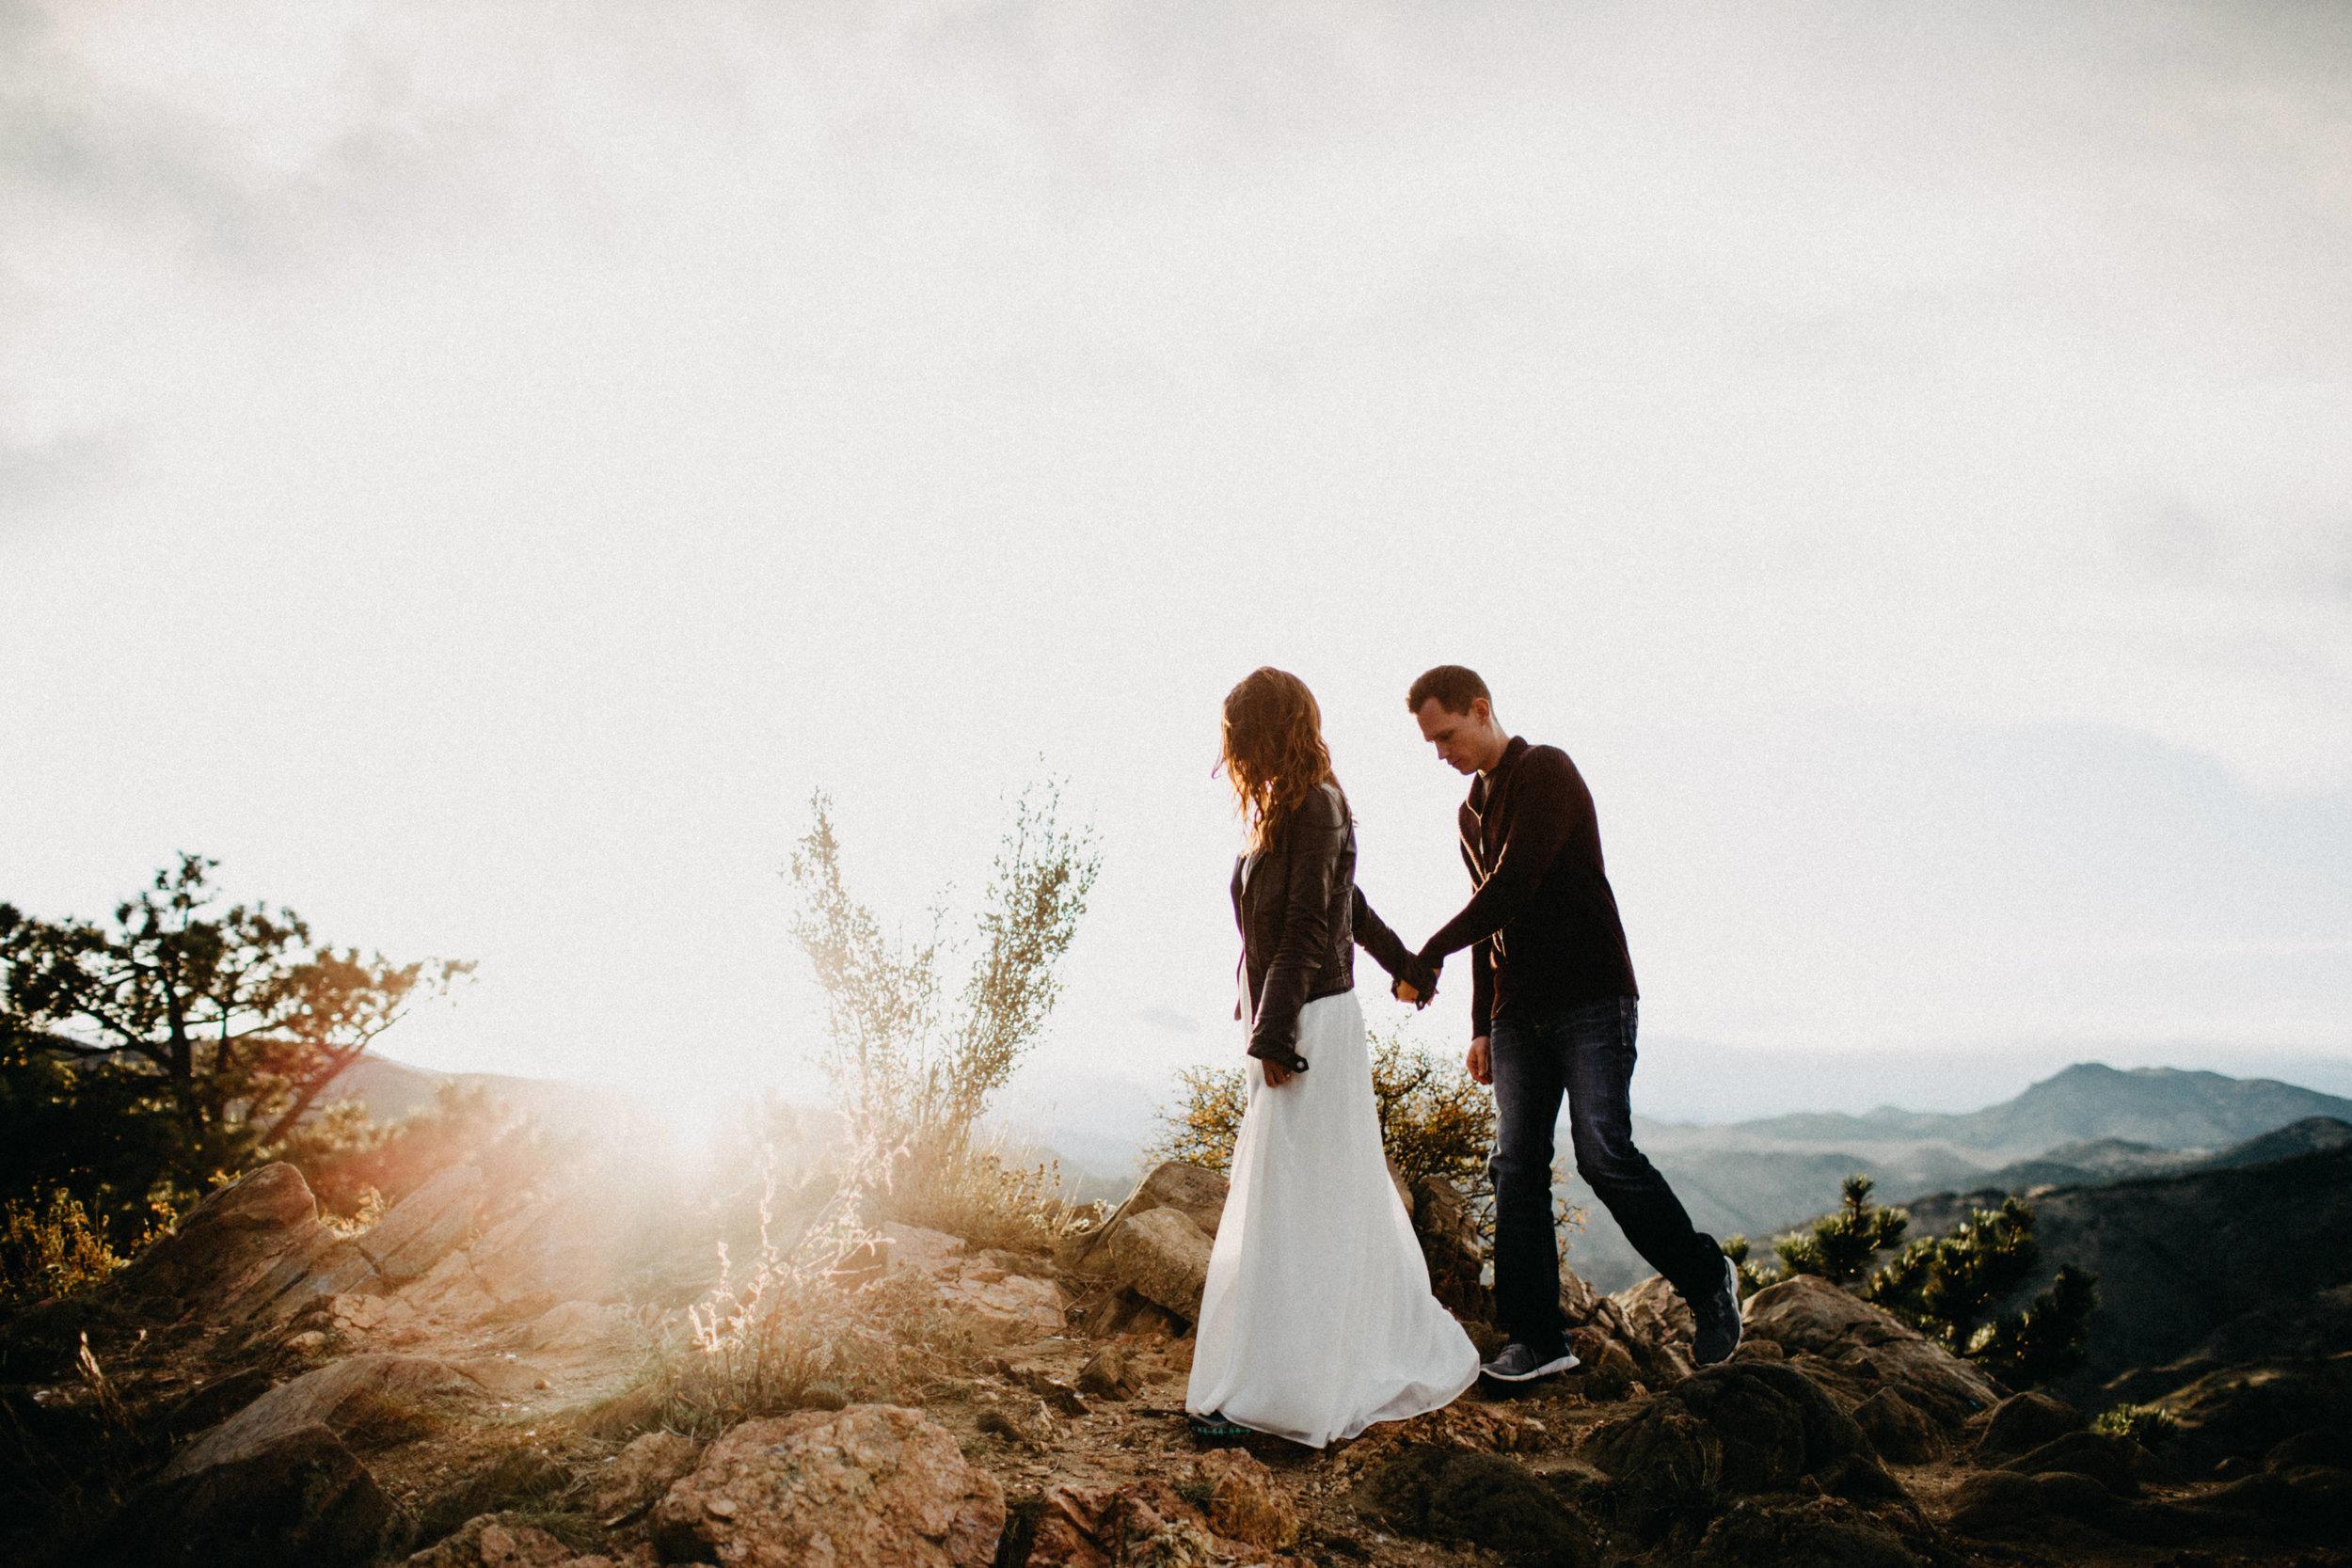 Elopement Photographers at Lookout Mountain, Colorado